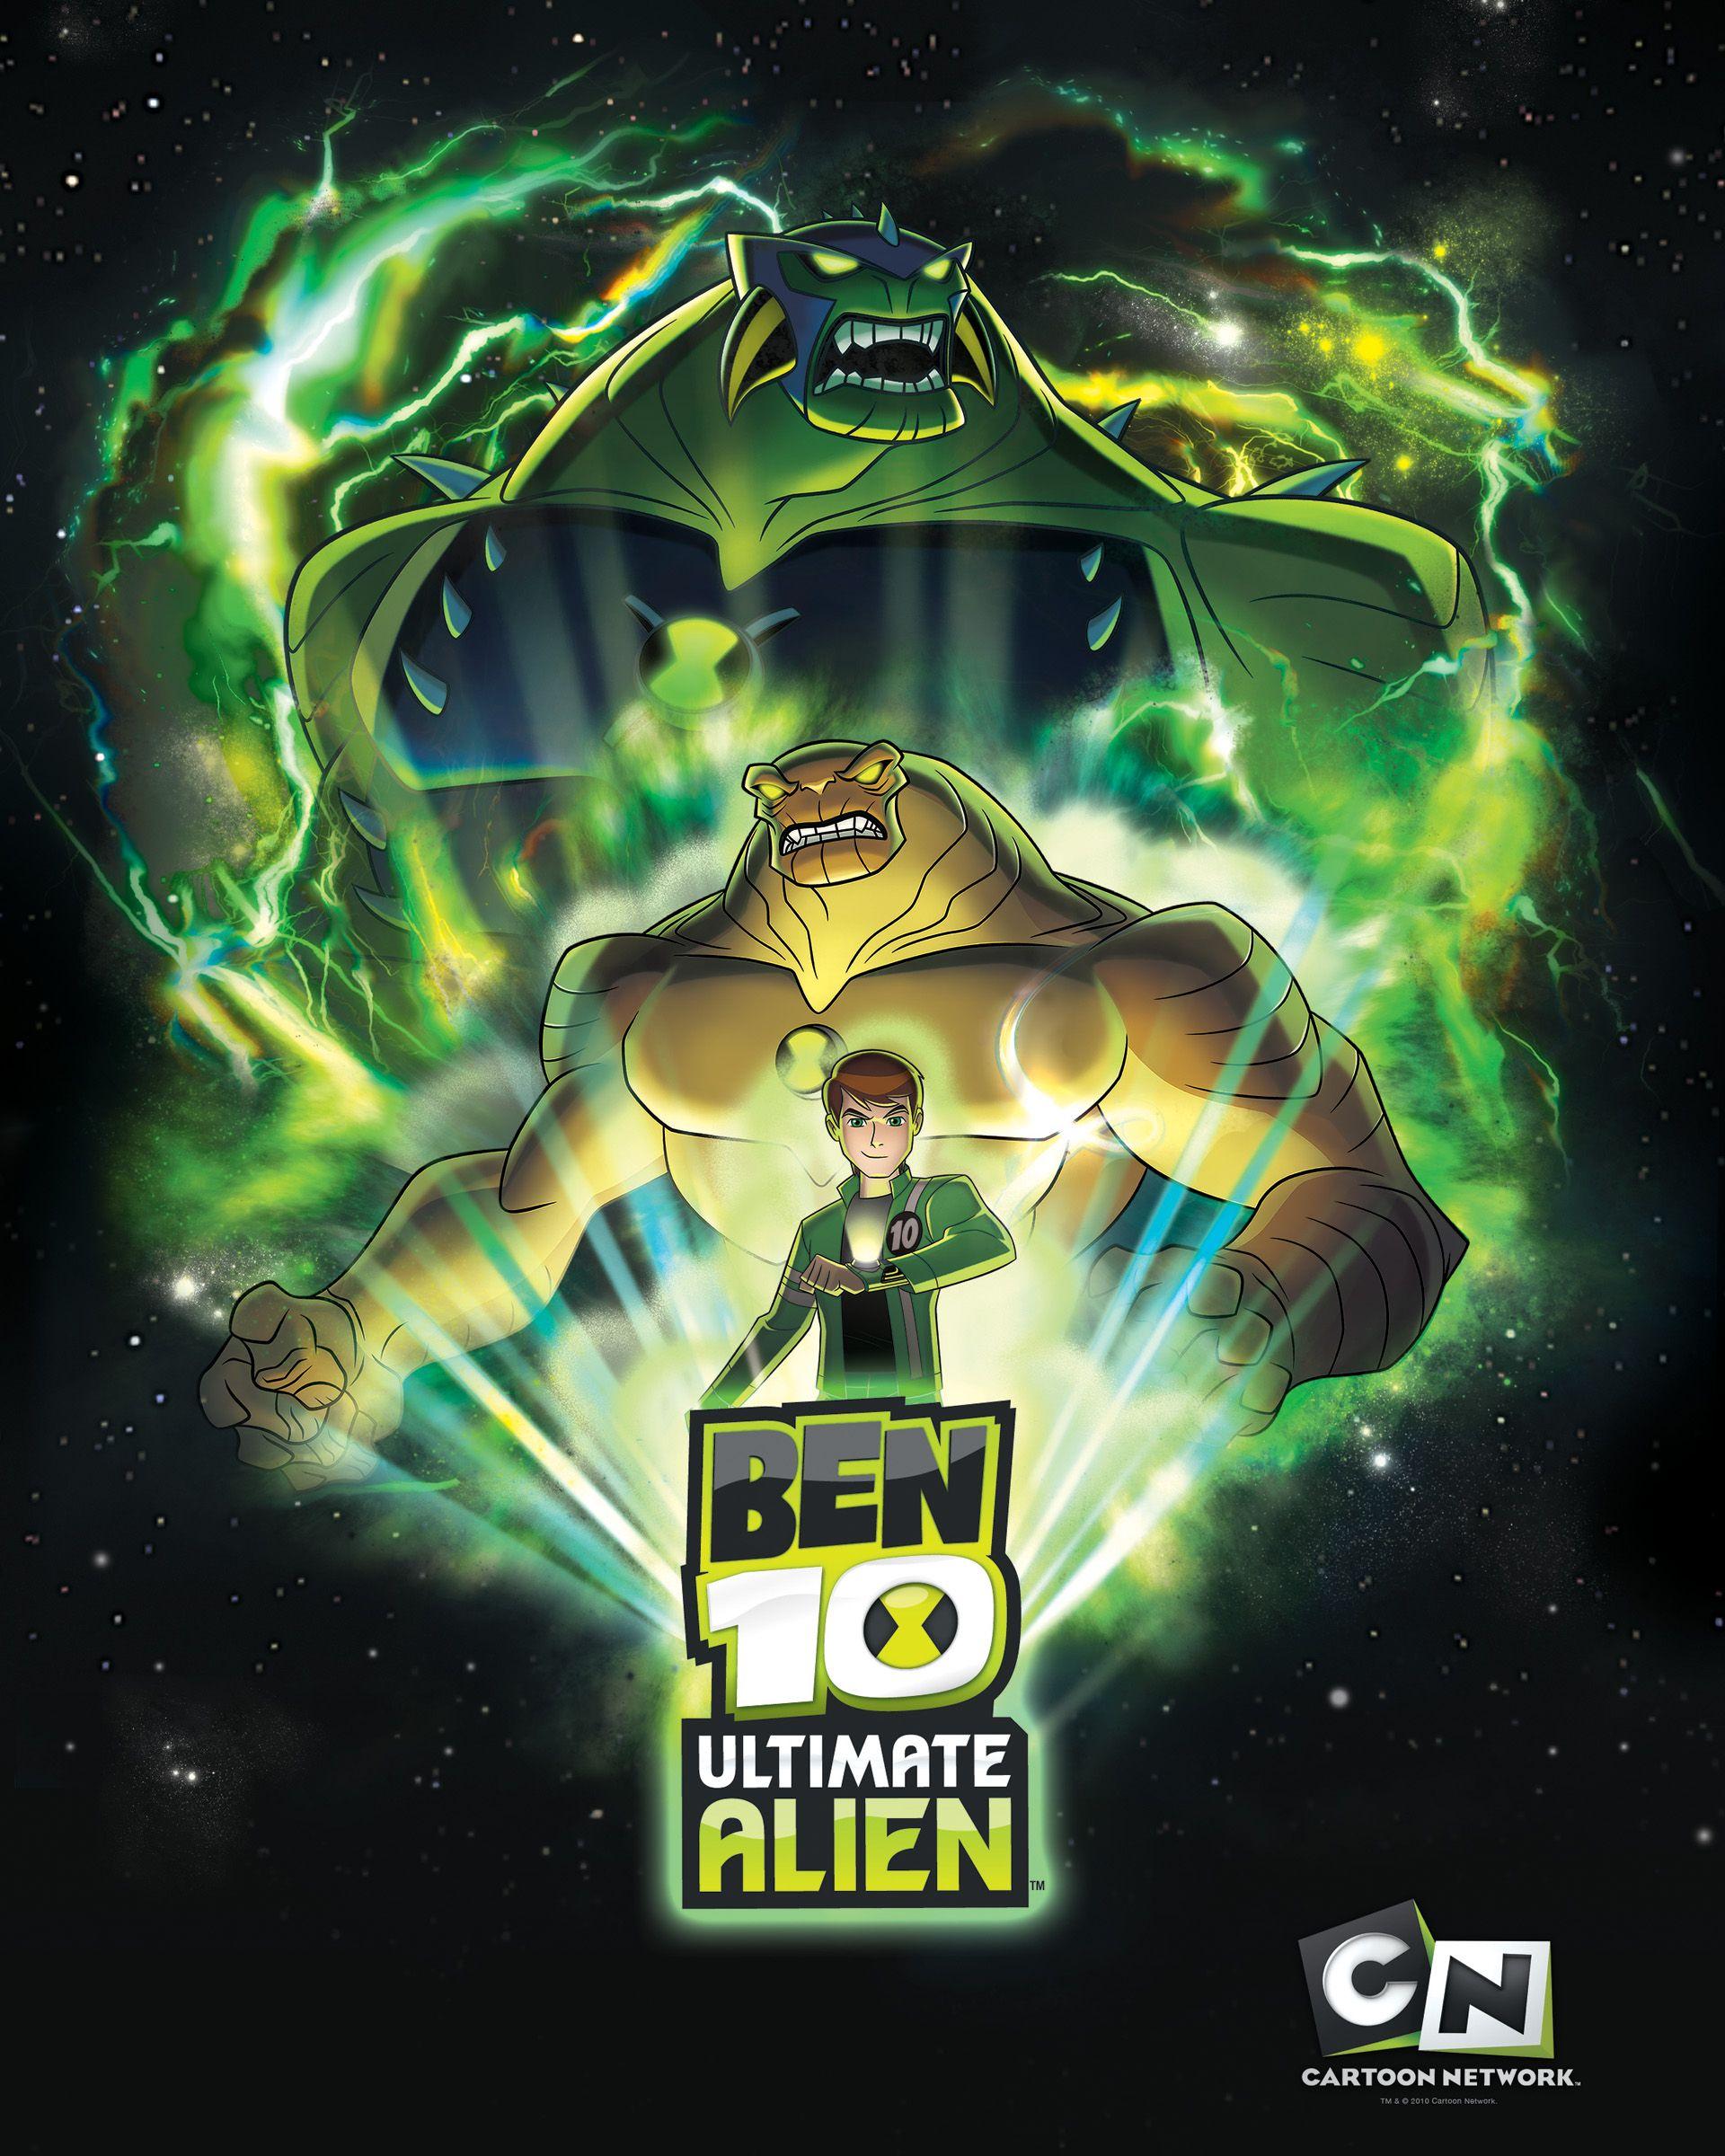 Pin By Myron Owens On It S Hero Time Ben 10 Ultimate Alien Ben 10 Alien Force Ben 10